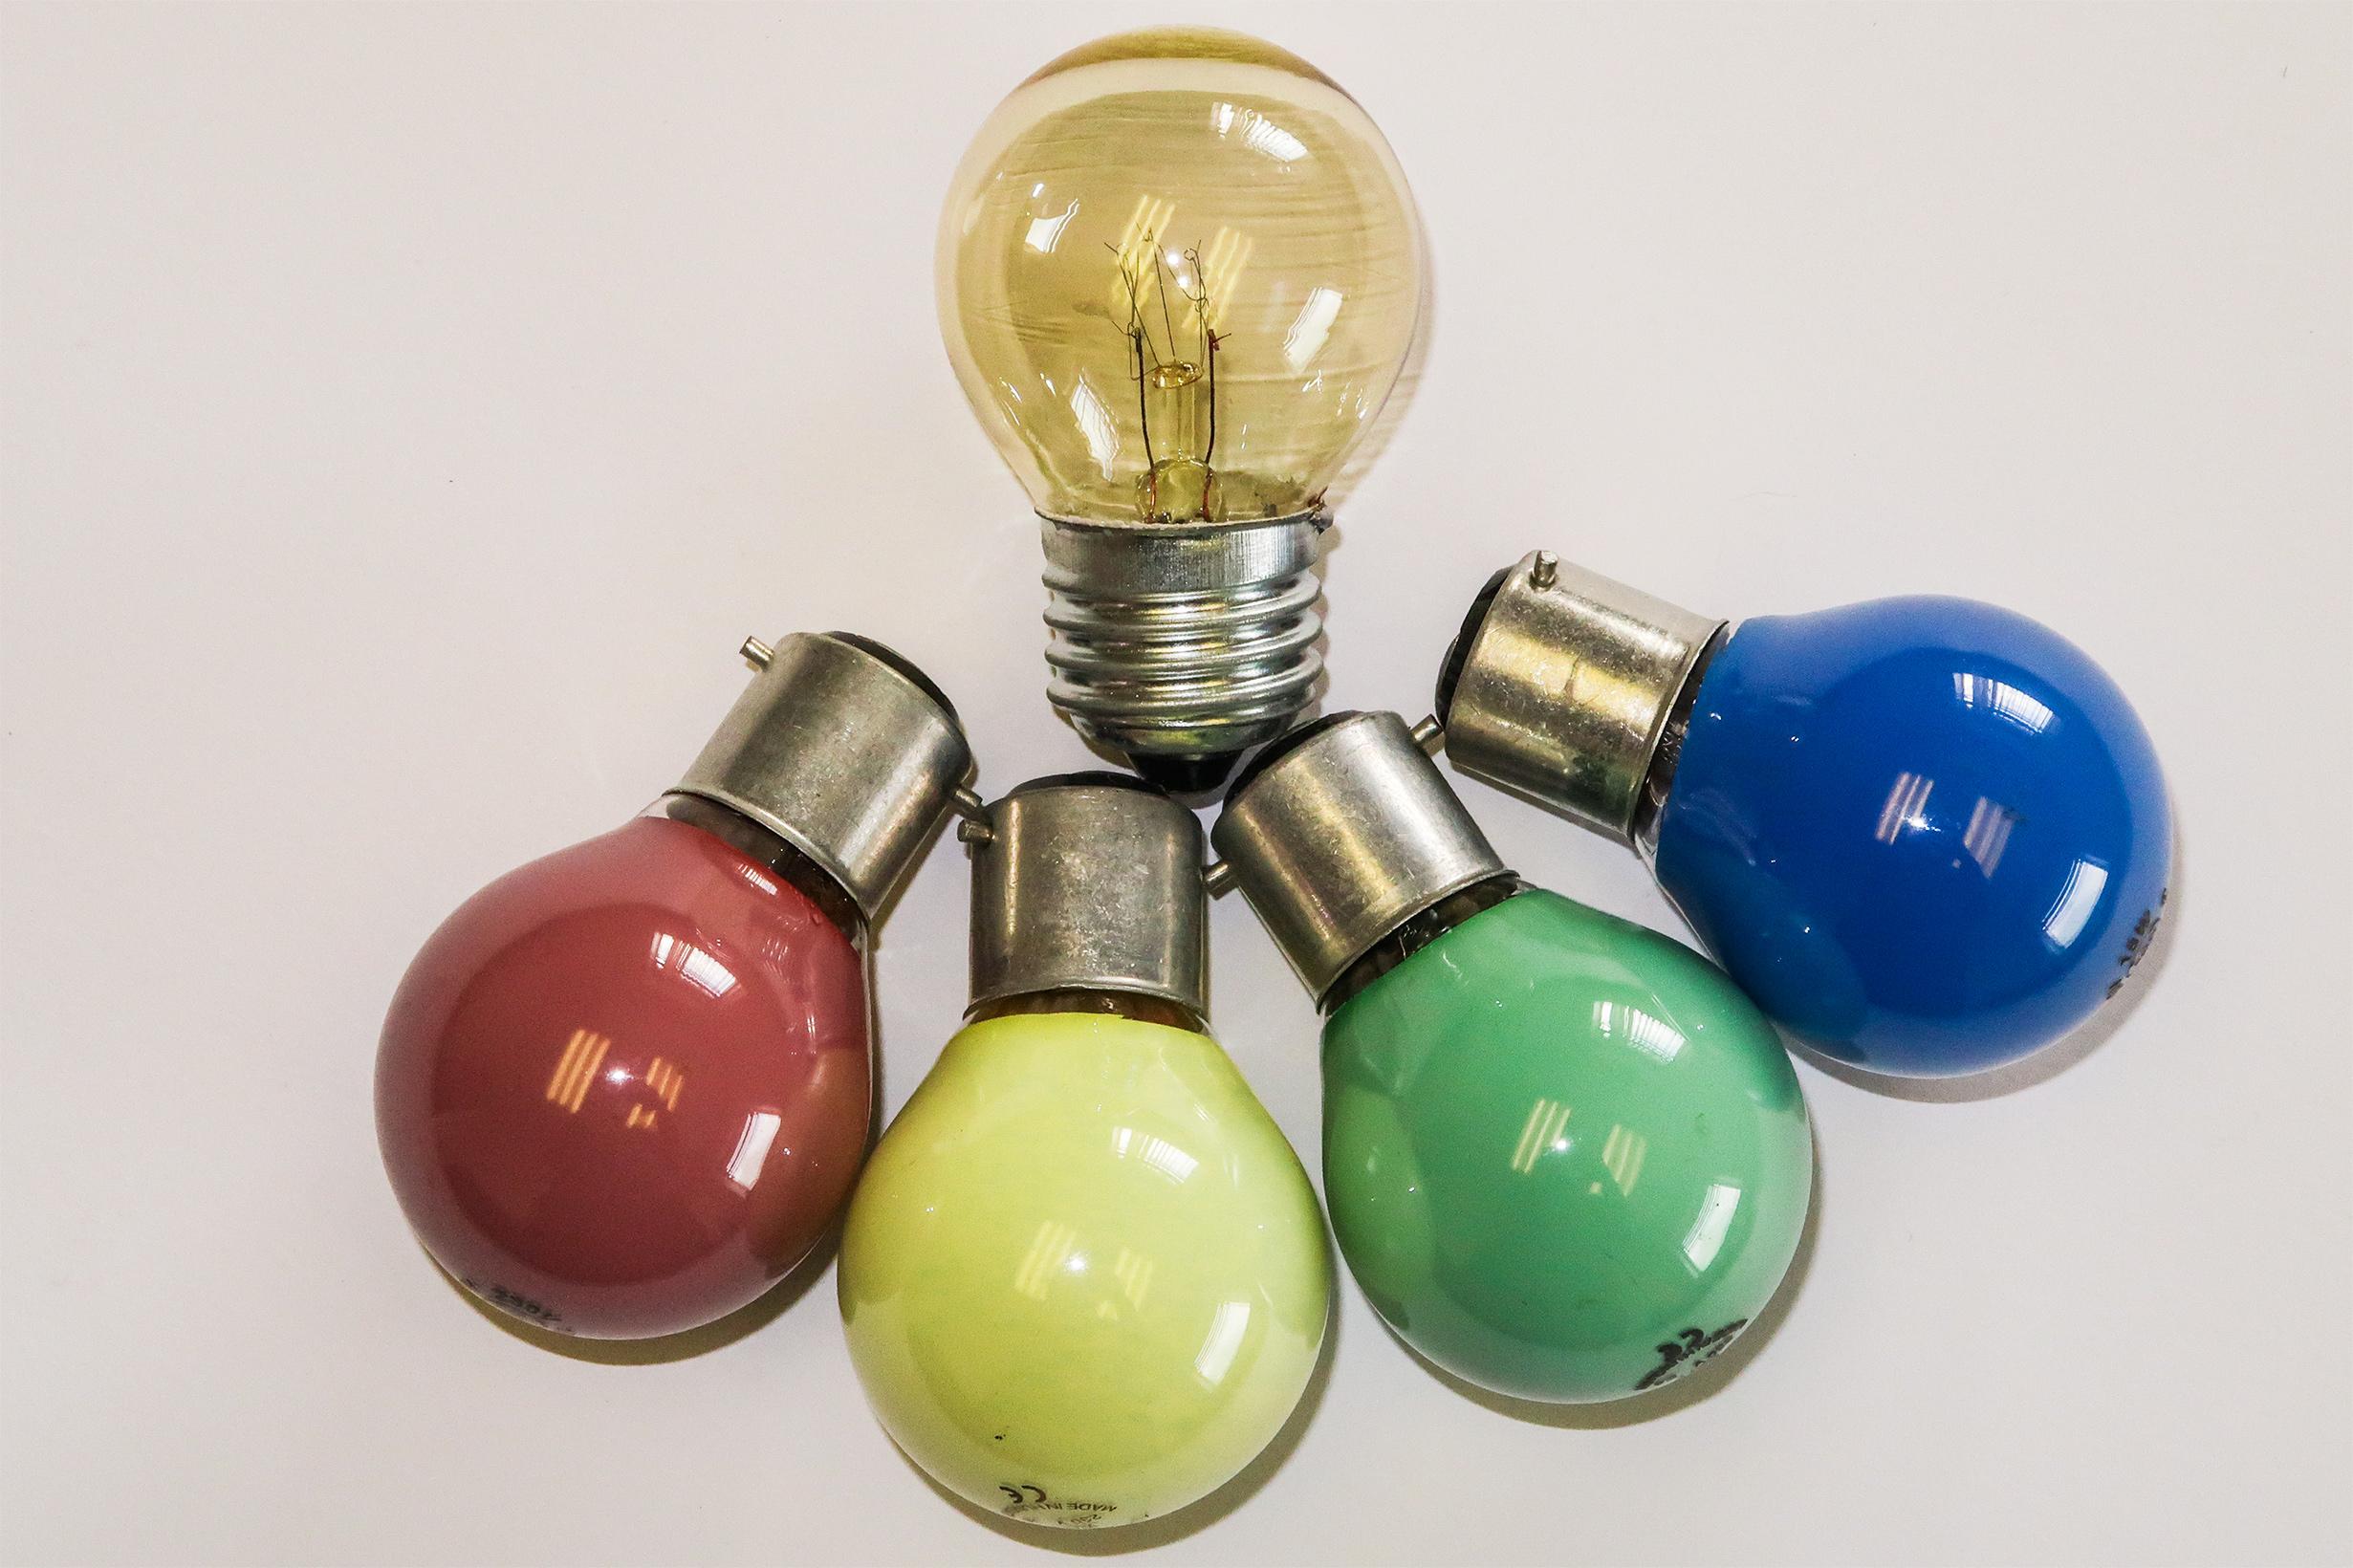 Tungsten Filament Bulbs